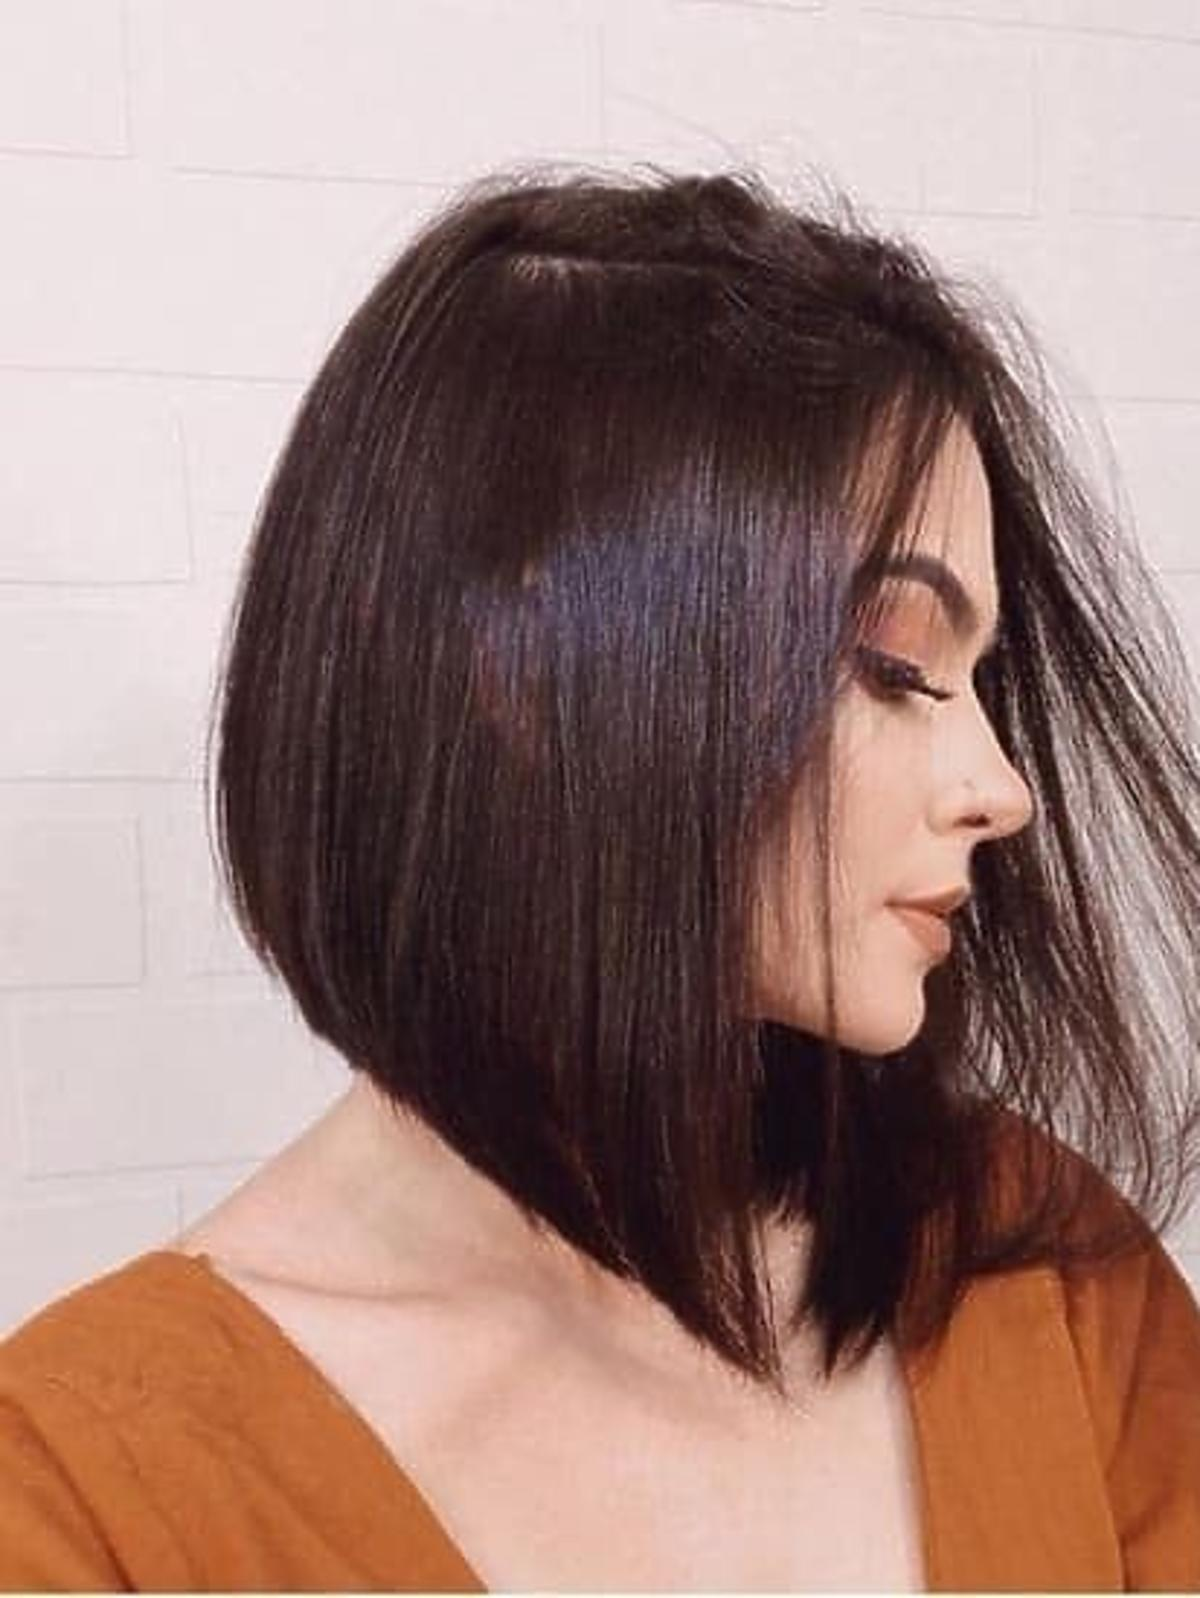 Modne fryzury na jesień 2020 - klasyczny angular bob